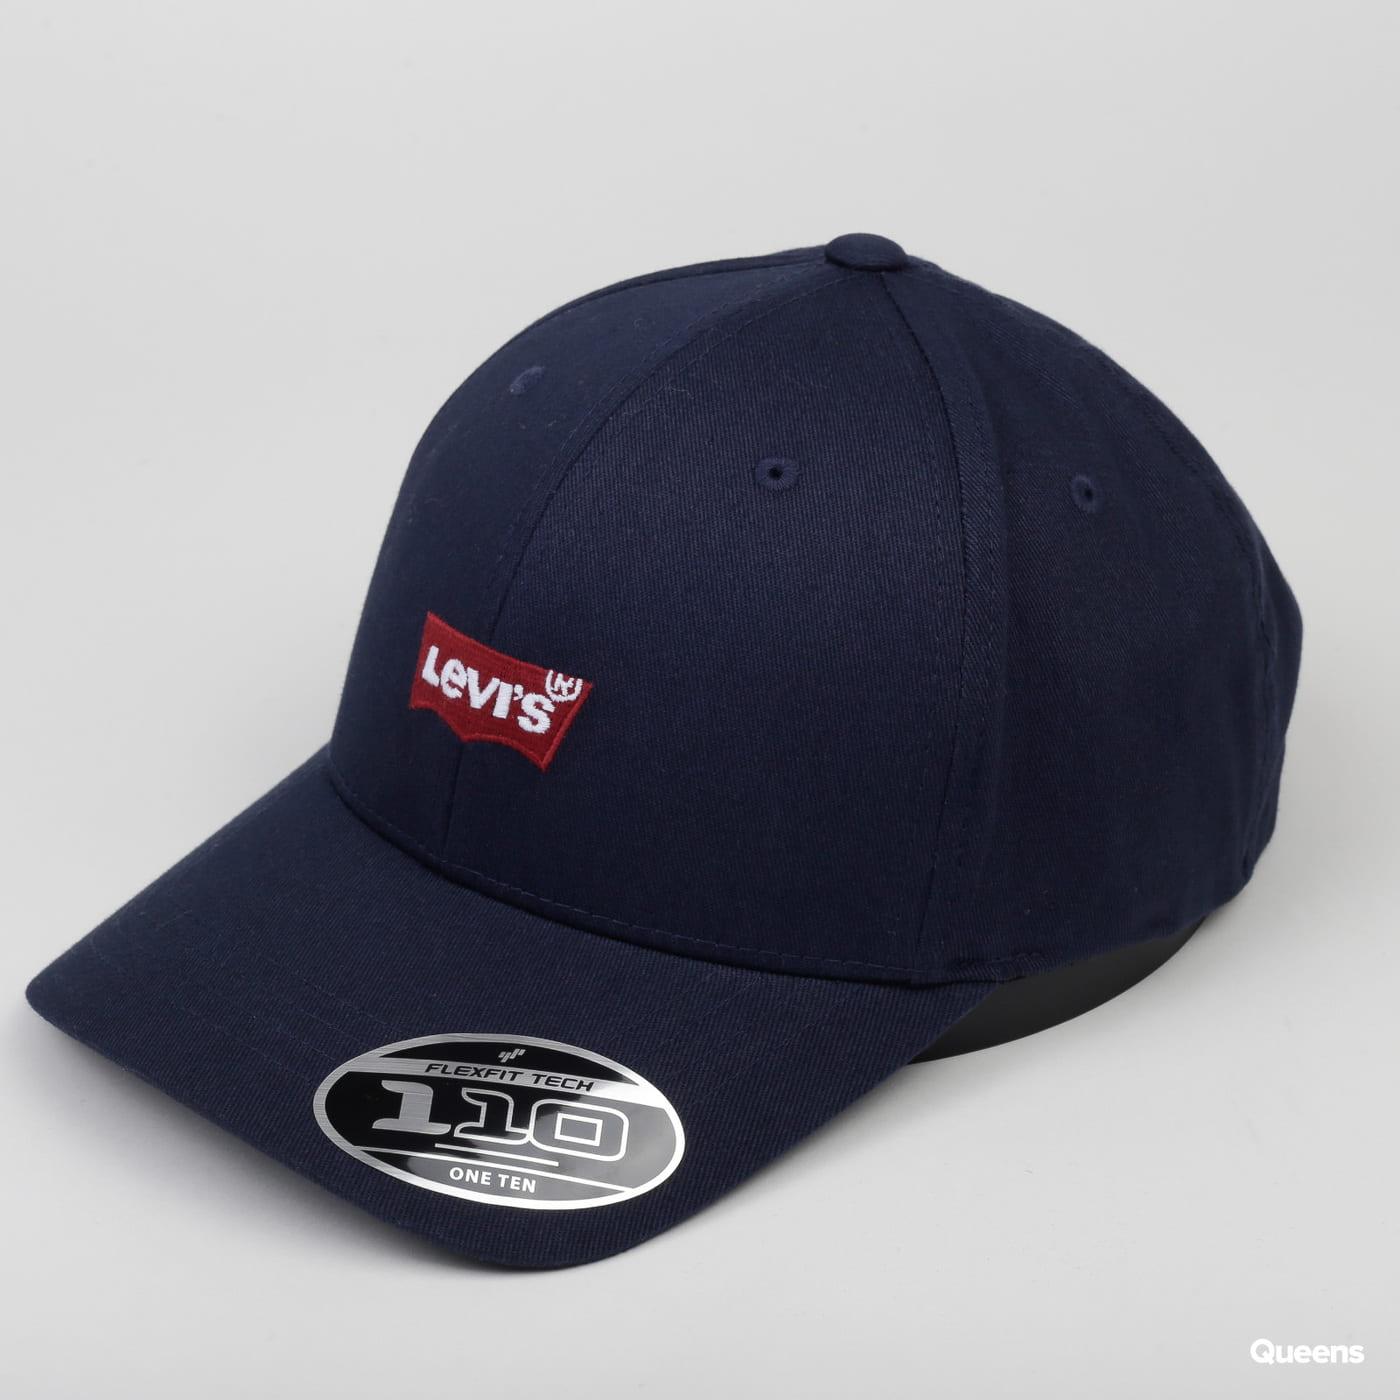 Levi's ® Batwing Flexfit Mid navy